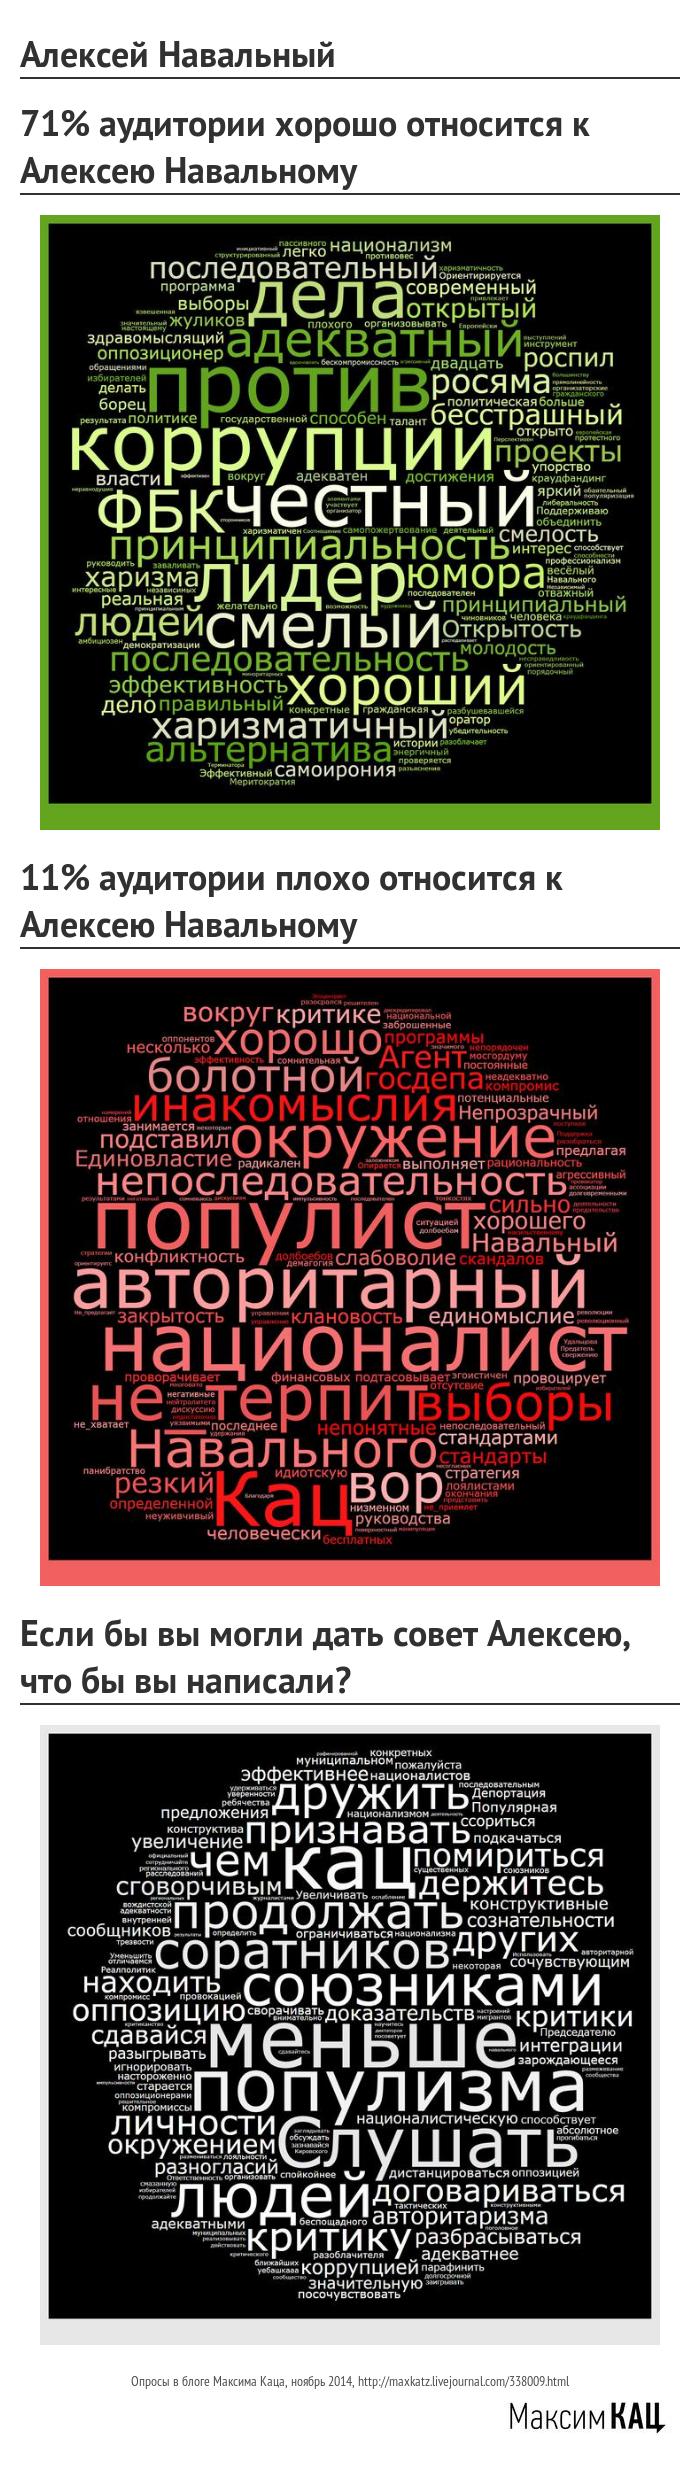 Aleksei_NavalLnii-4